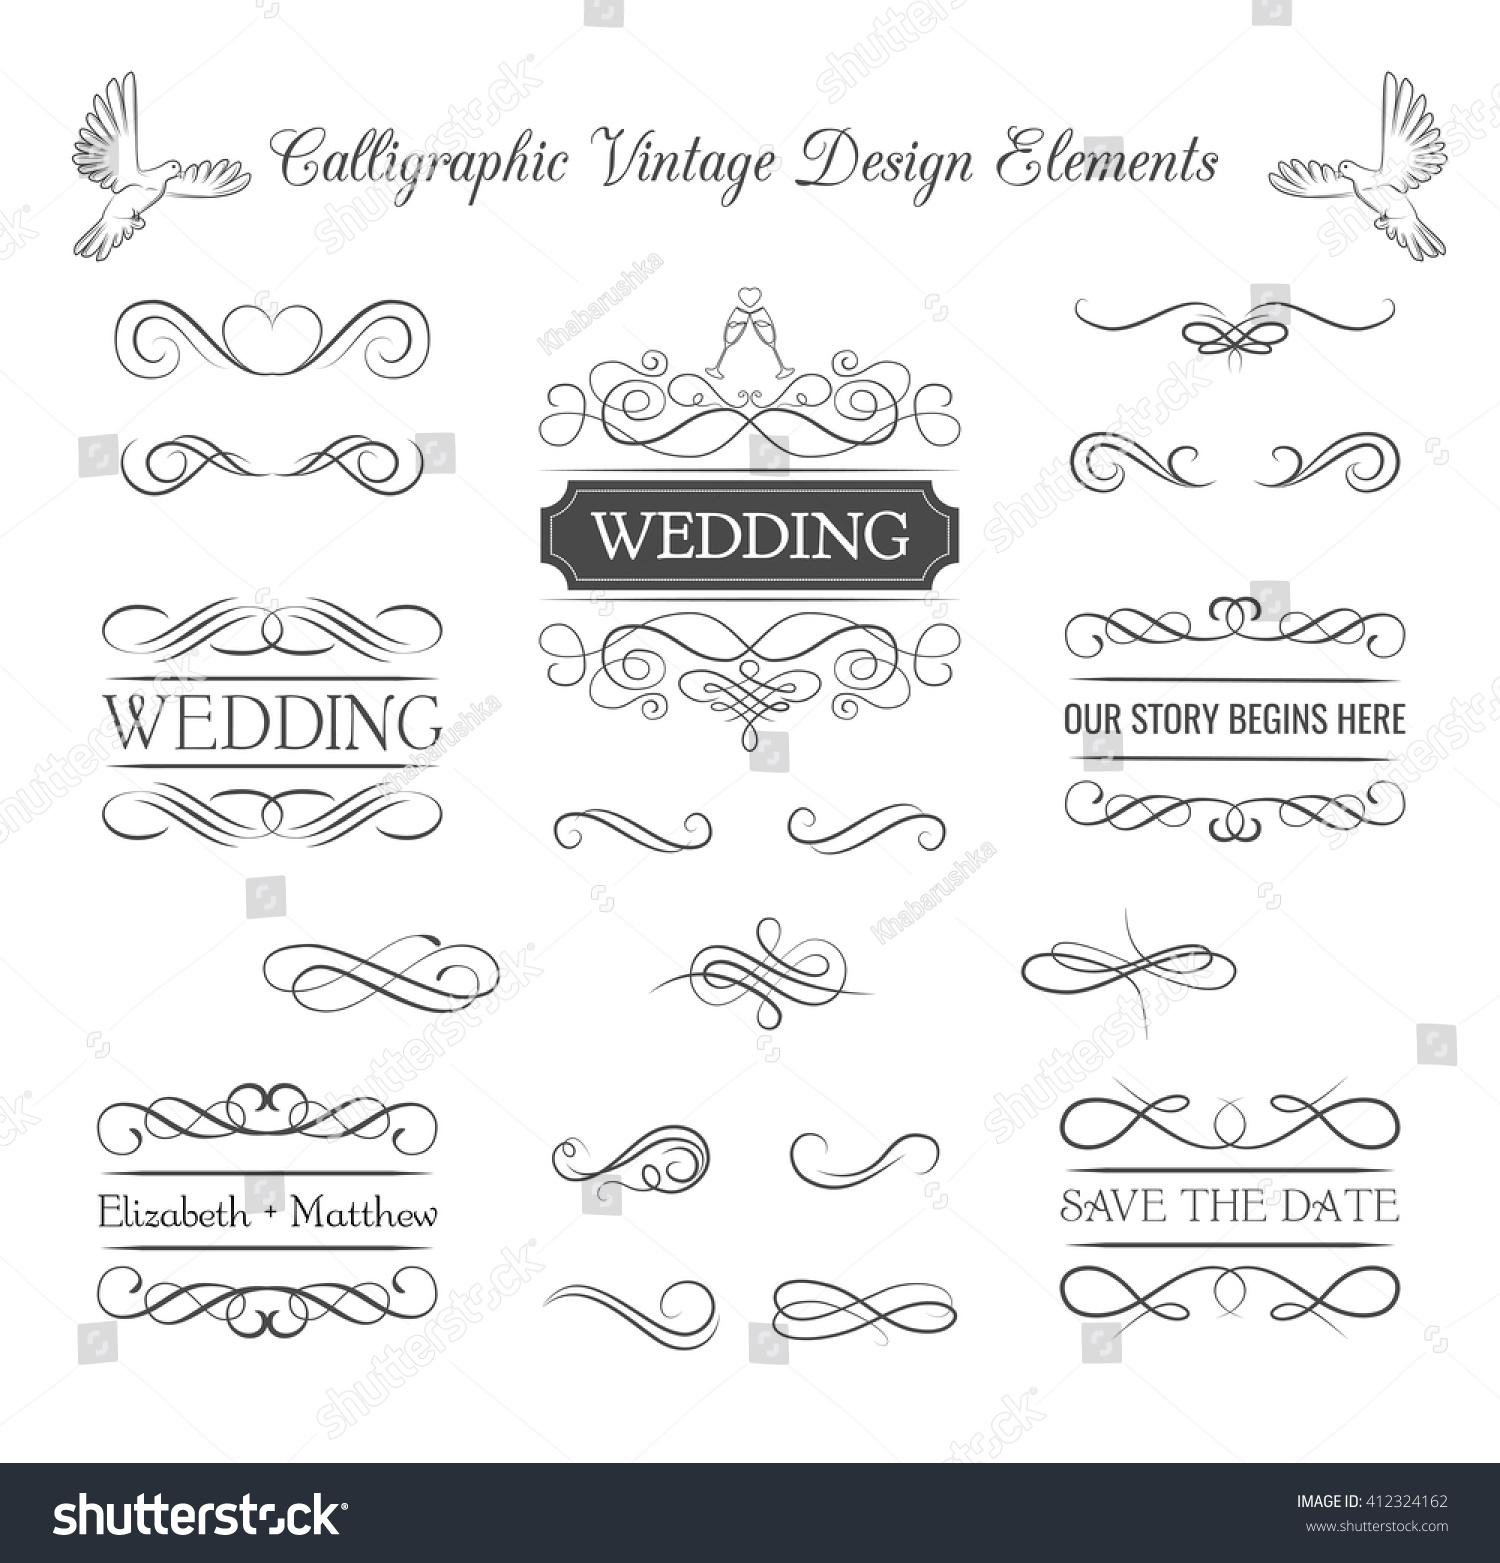 Wedding ornaments decorative elements vintage ribbon stock vector wedding ornaments decorative elements vintage ribbon frame badge vector love element wedding junglespirit Gallery